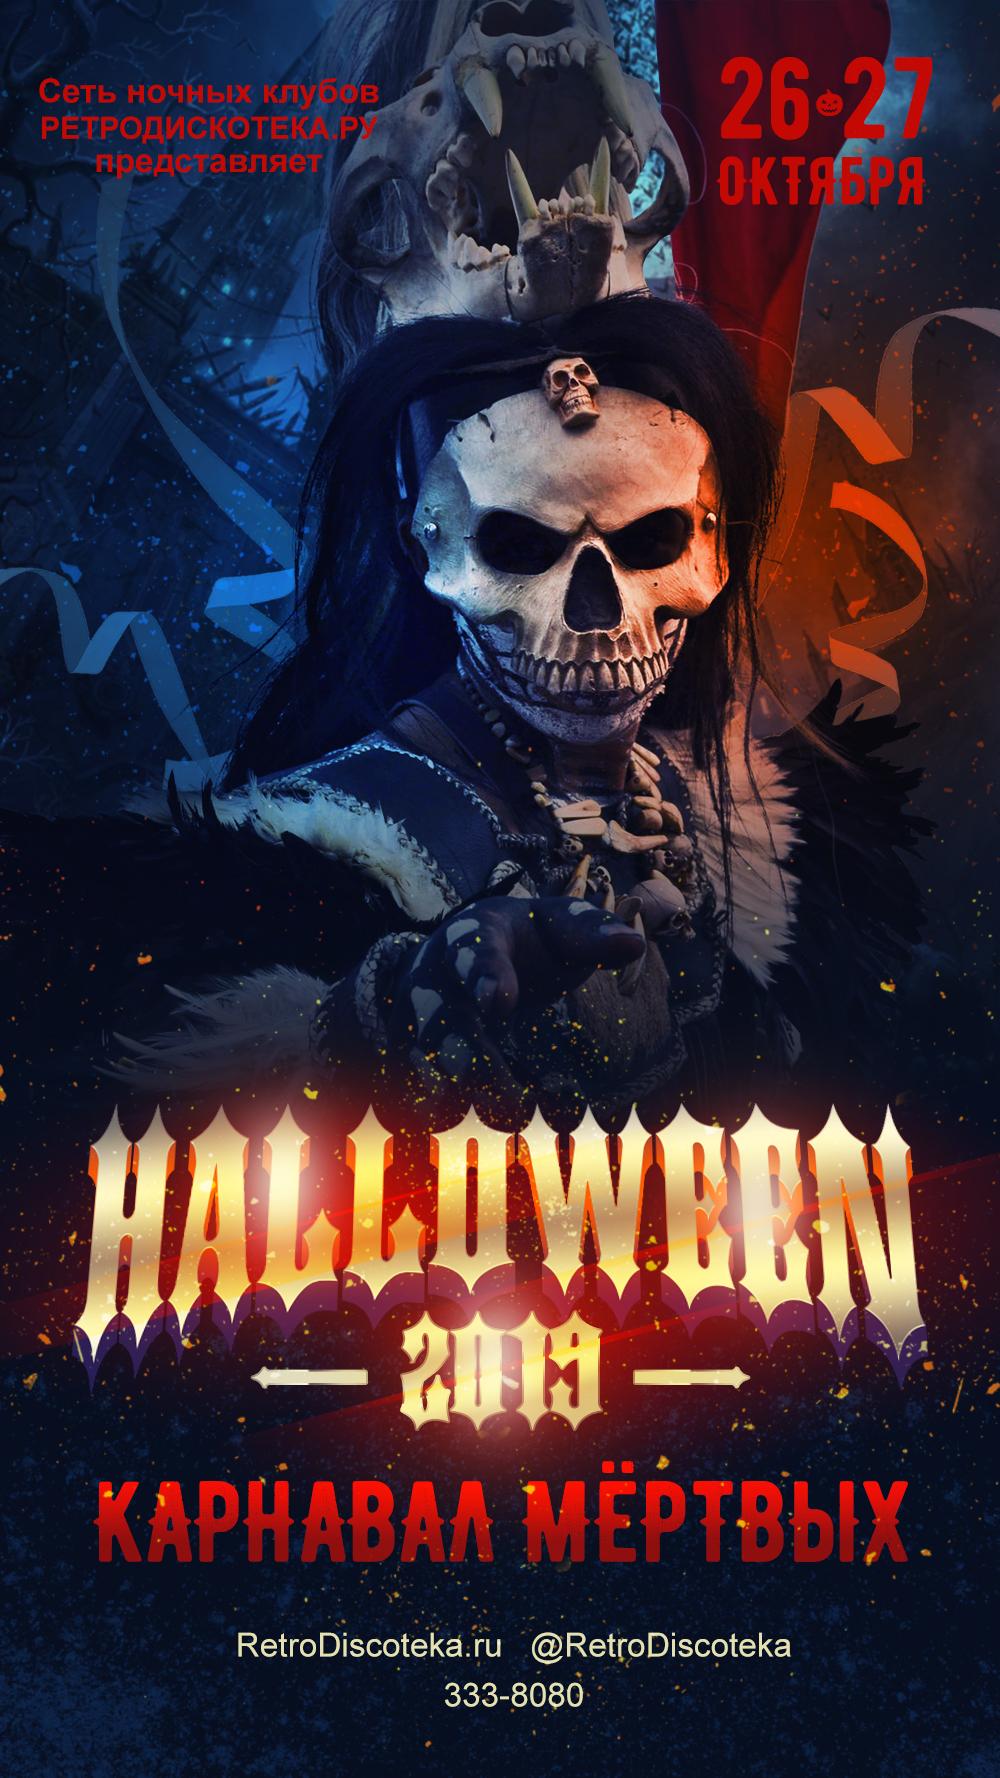 Дизайн афиши Хэллоуин 2019 для сети ночных клубов фото f_0755c6c2992e5414.jpg